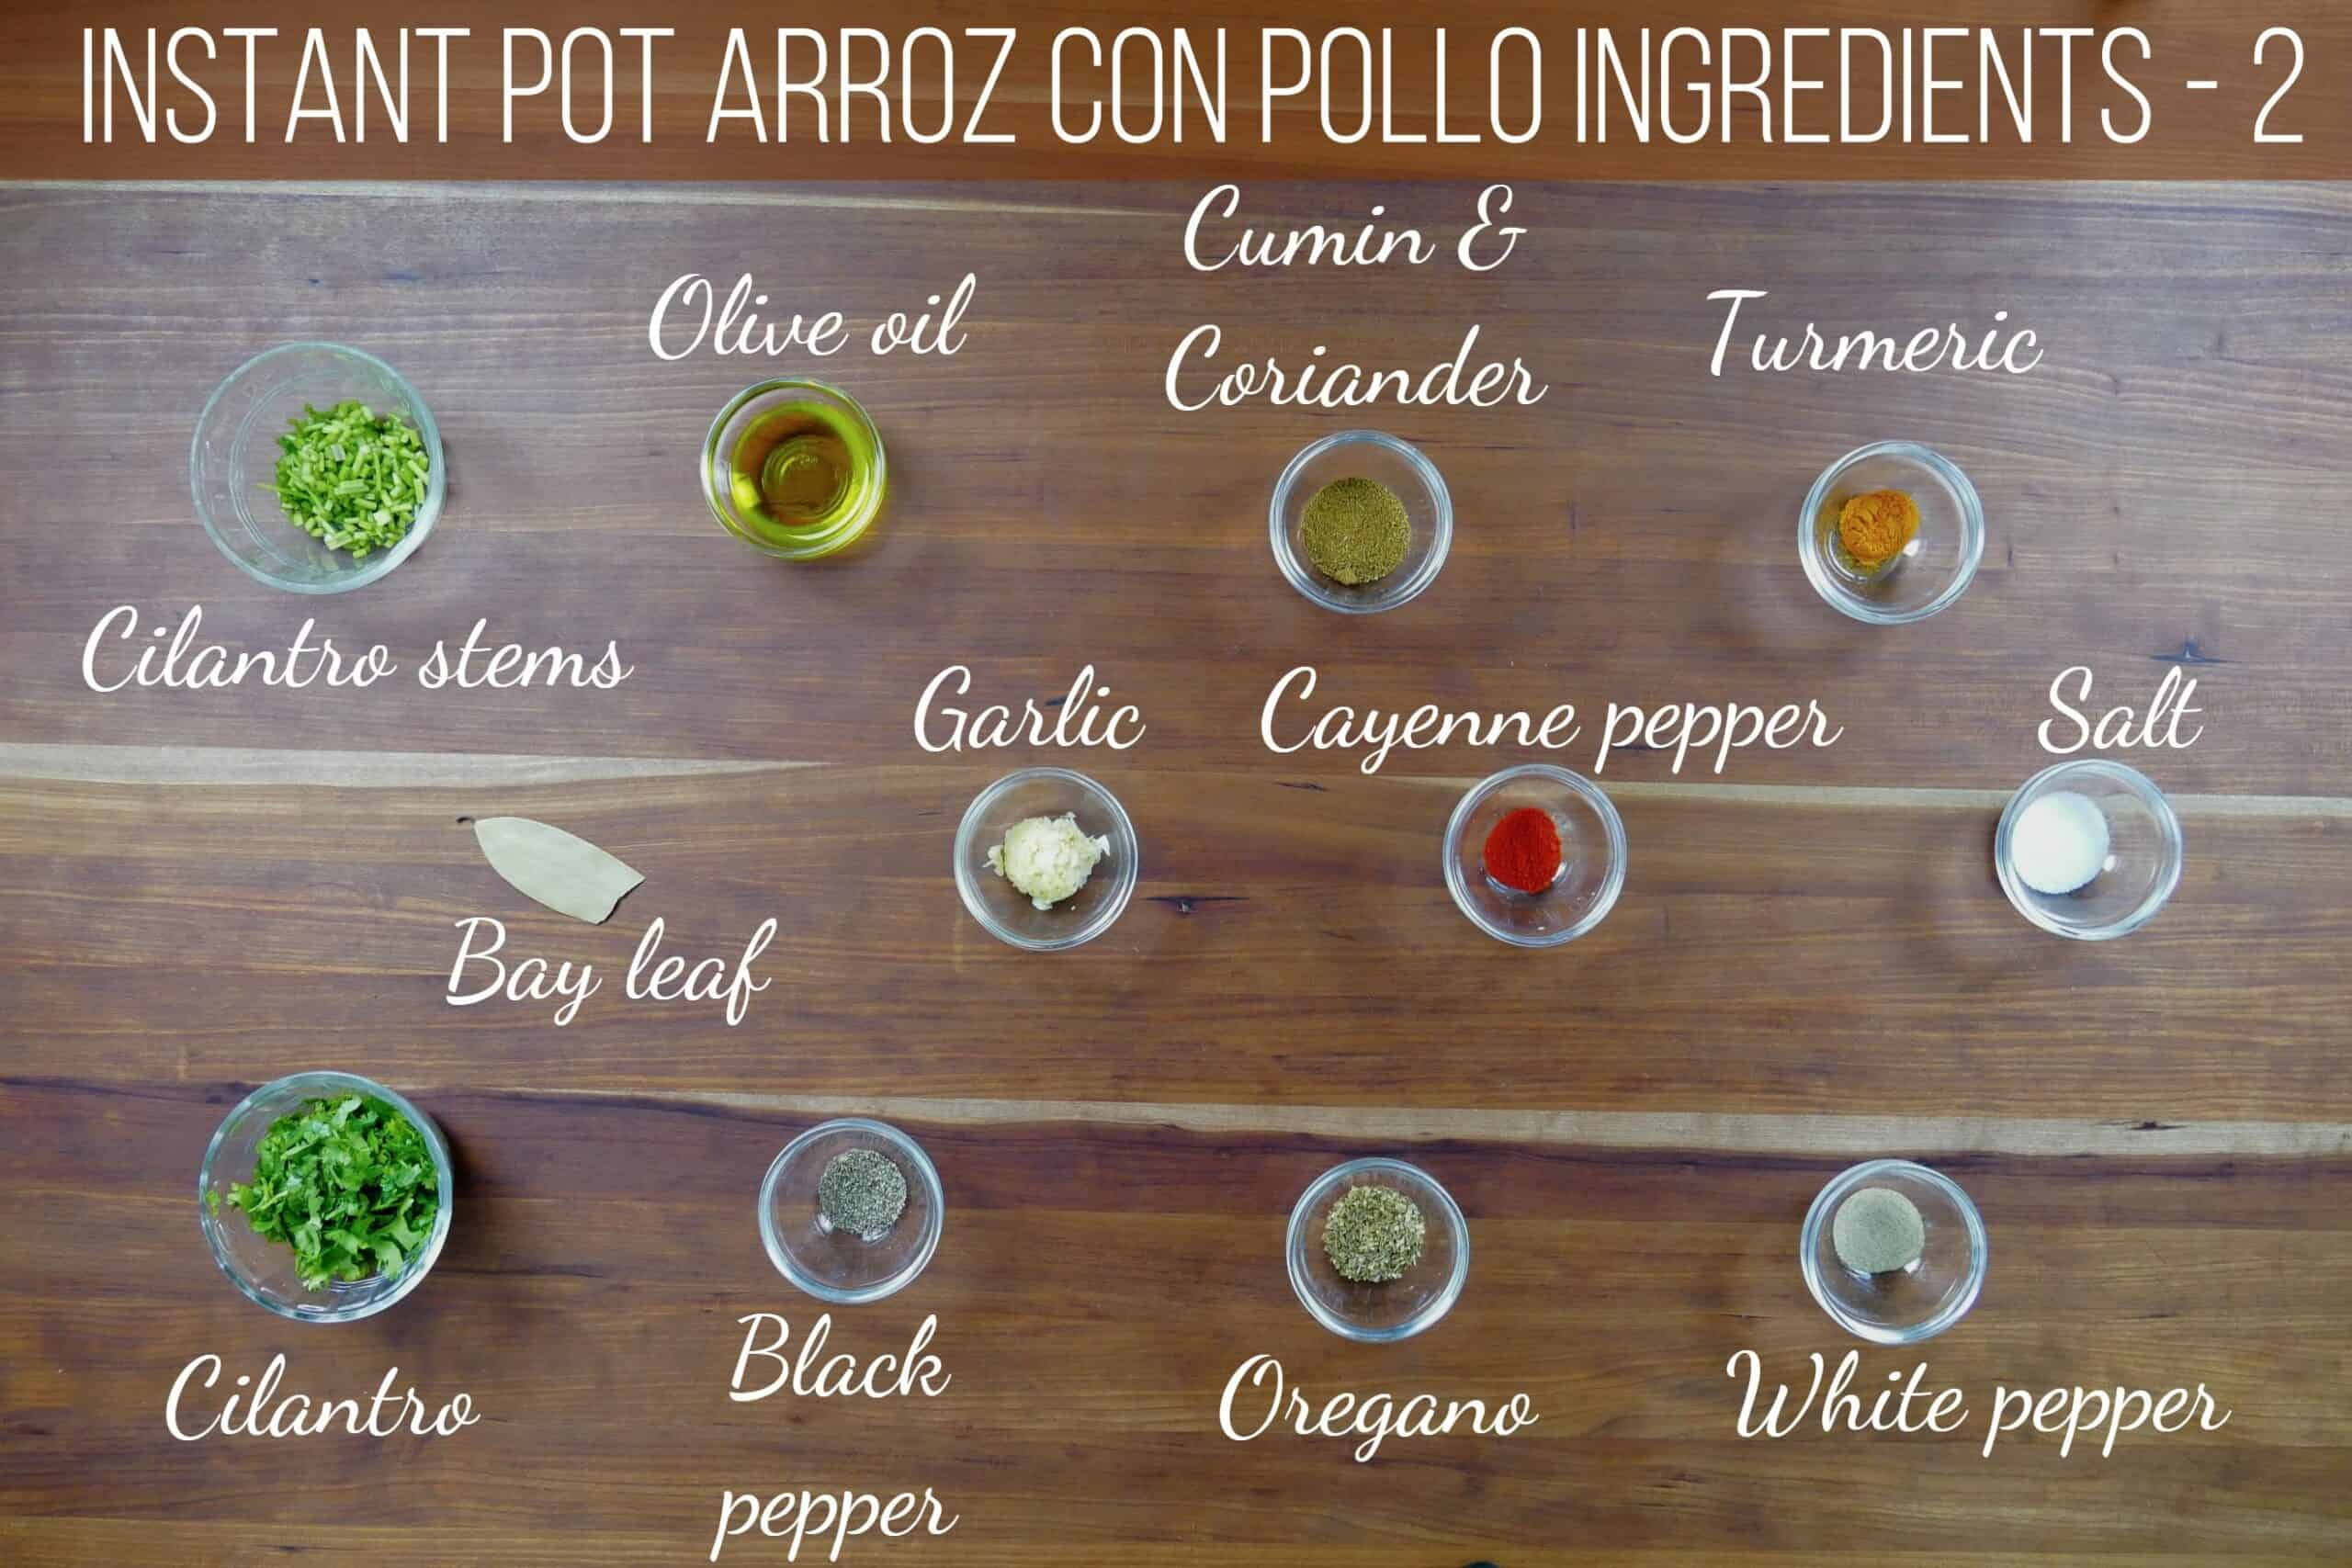 instant pot arroz con pollo ingredients - cilantro stems, olive oil, cumin & coriander, turmeric, bay leaf, garlic, cayenne pepper, salt, cilantro, black pepper, oregano, white pepper - Paint the Kitchen Red